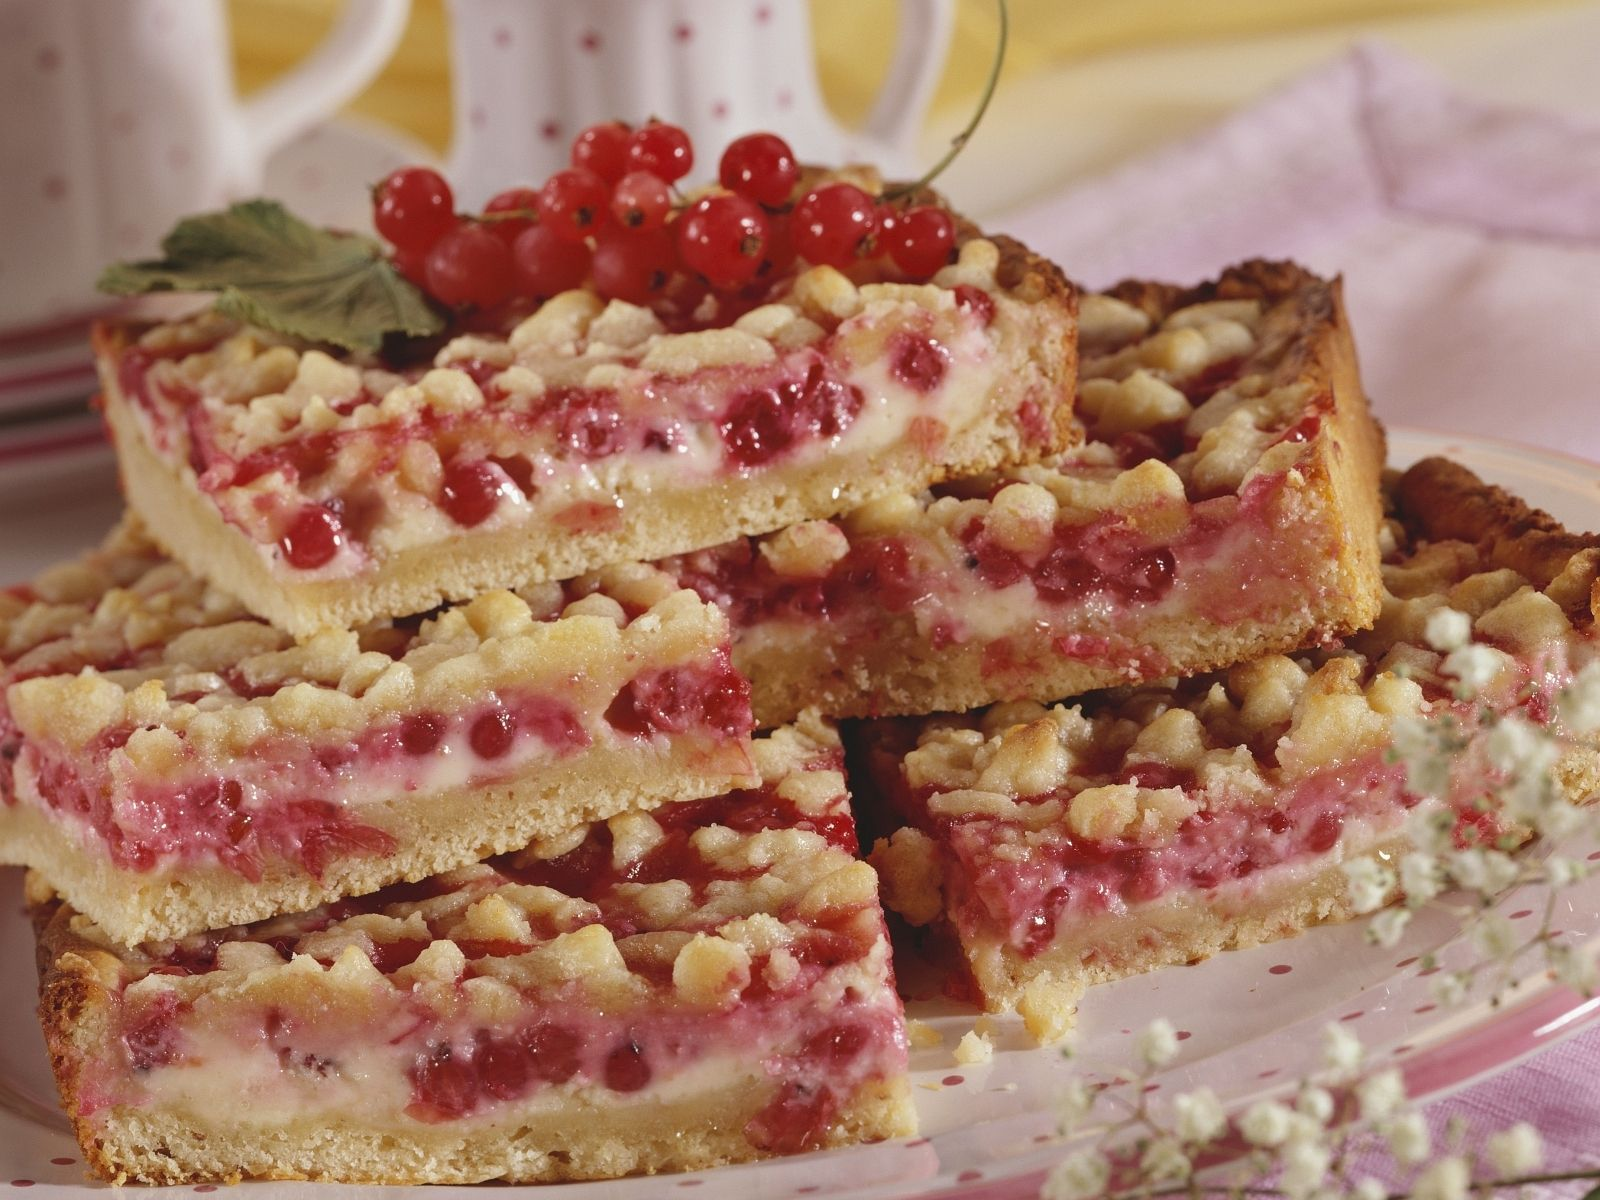 Johannisbeer Streusel Kuchen Rezept Eat Smarter